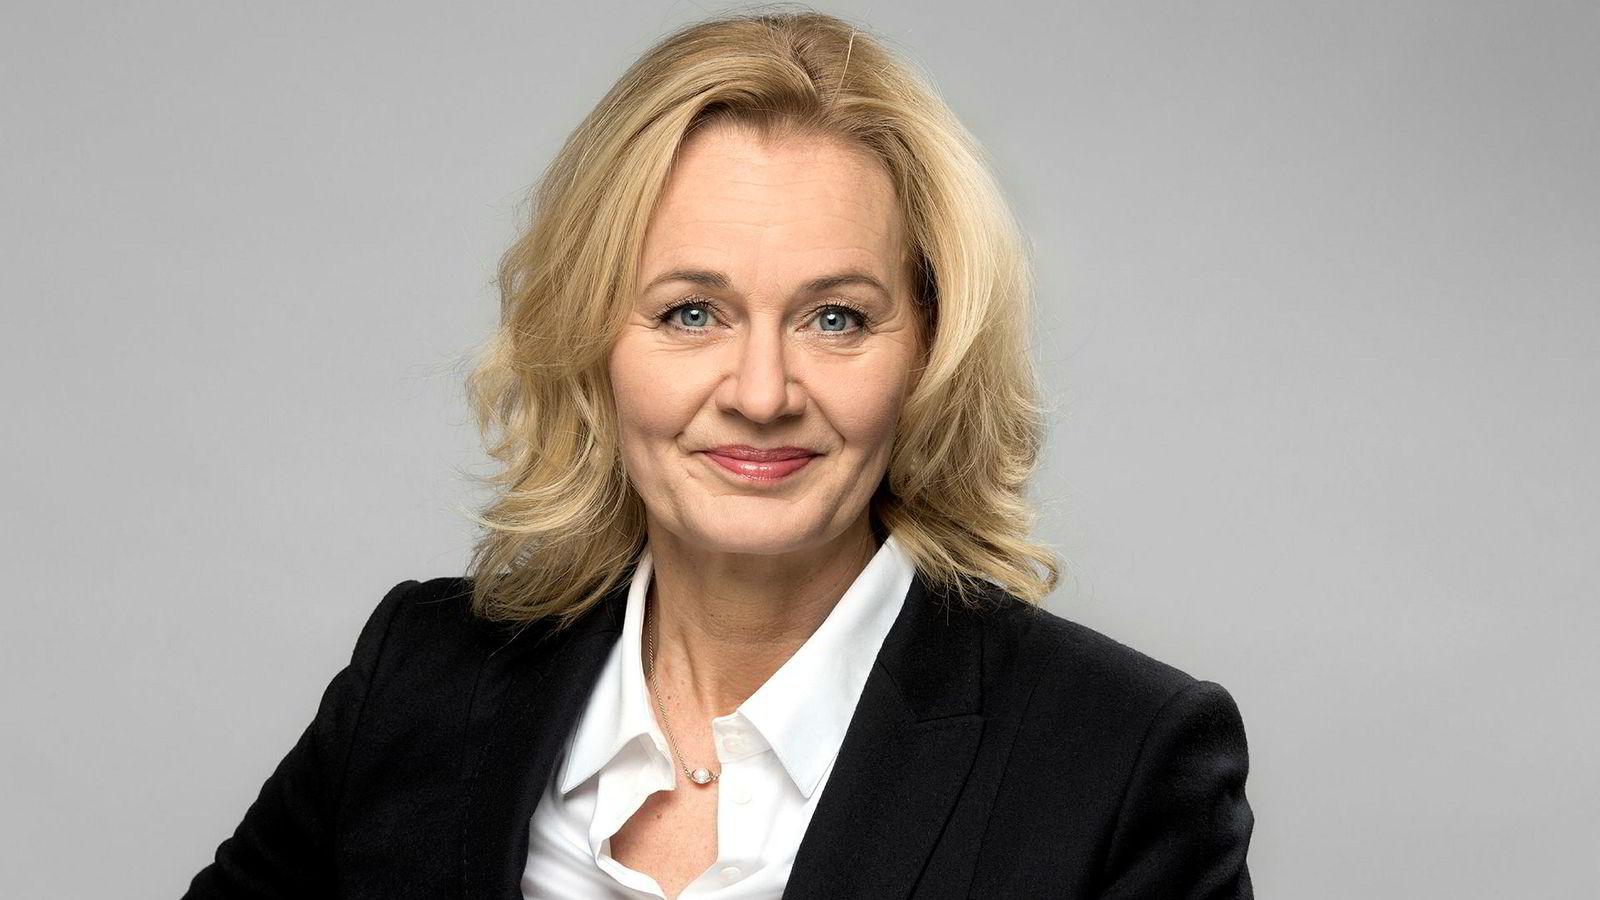 Handelsbankens konsernsjef Carina Åkerström.